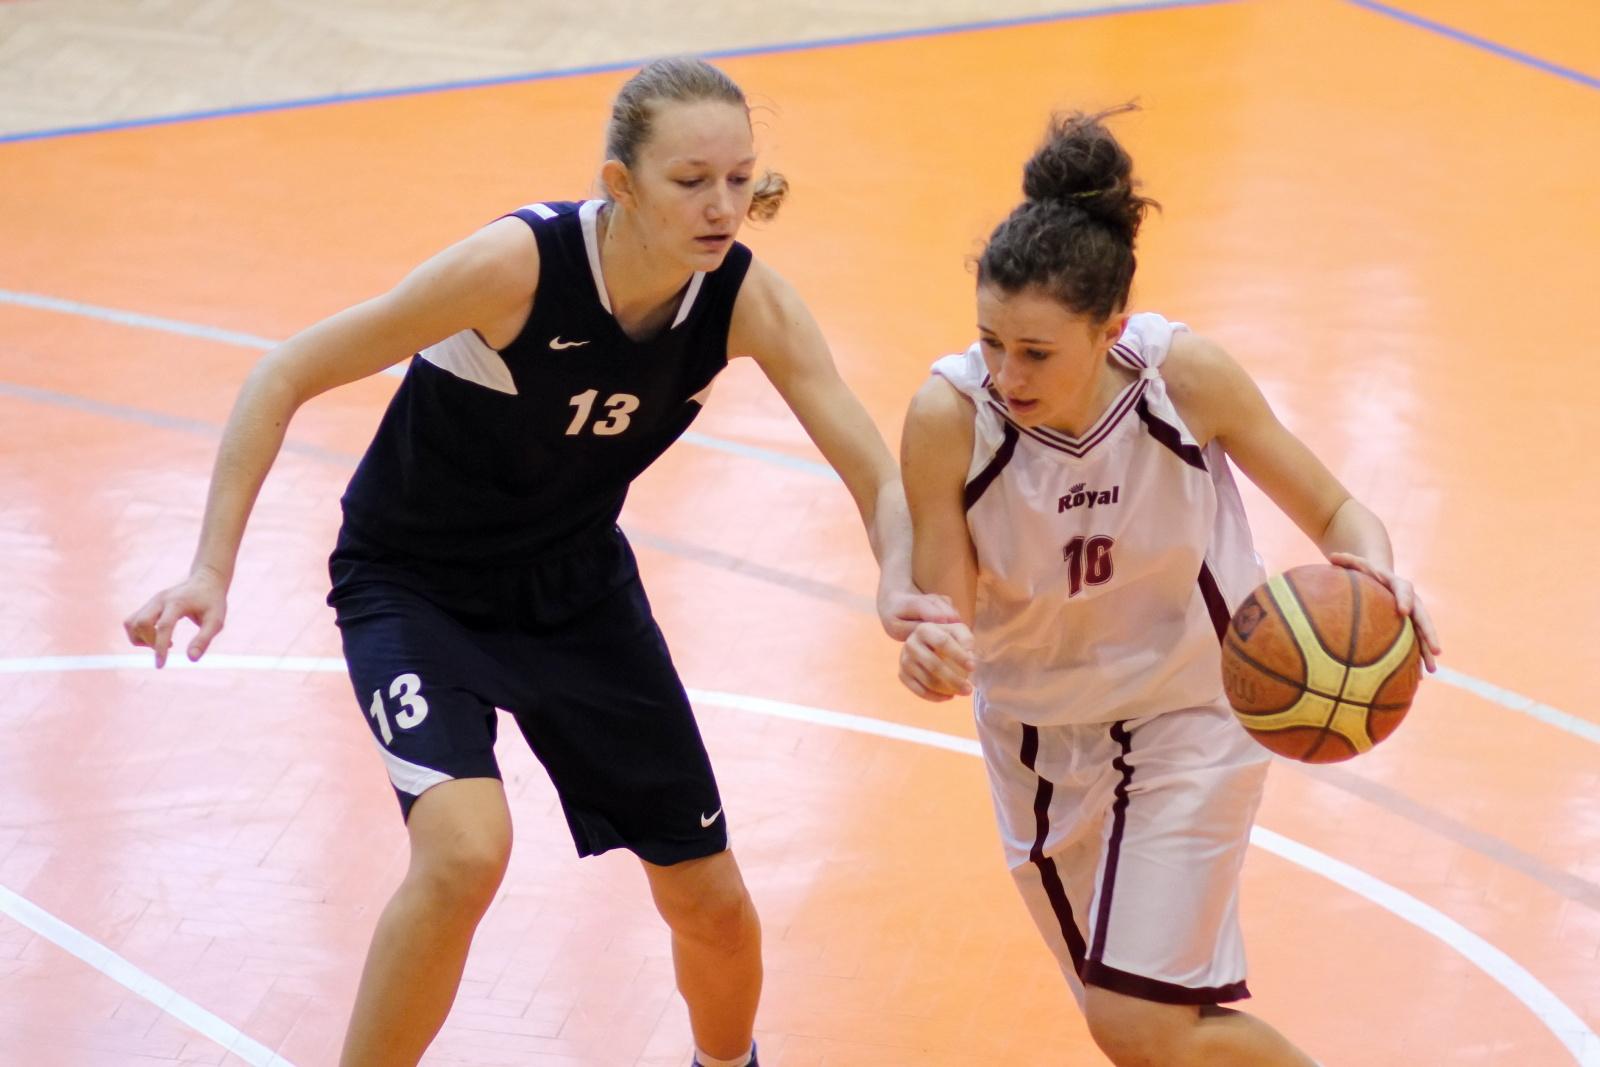 bk-zvolen-petrzalka-basketbal-juniorky-2011-3